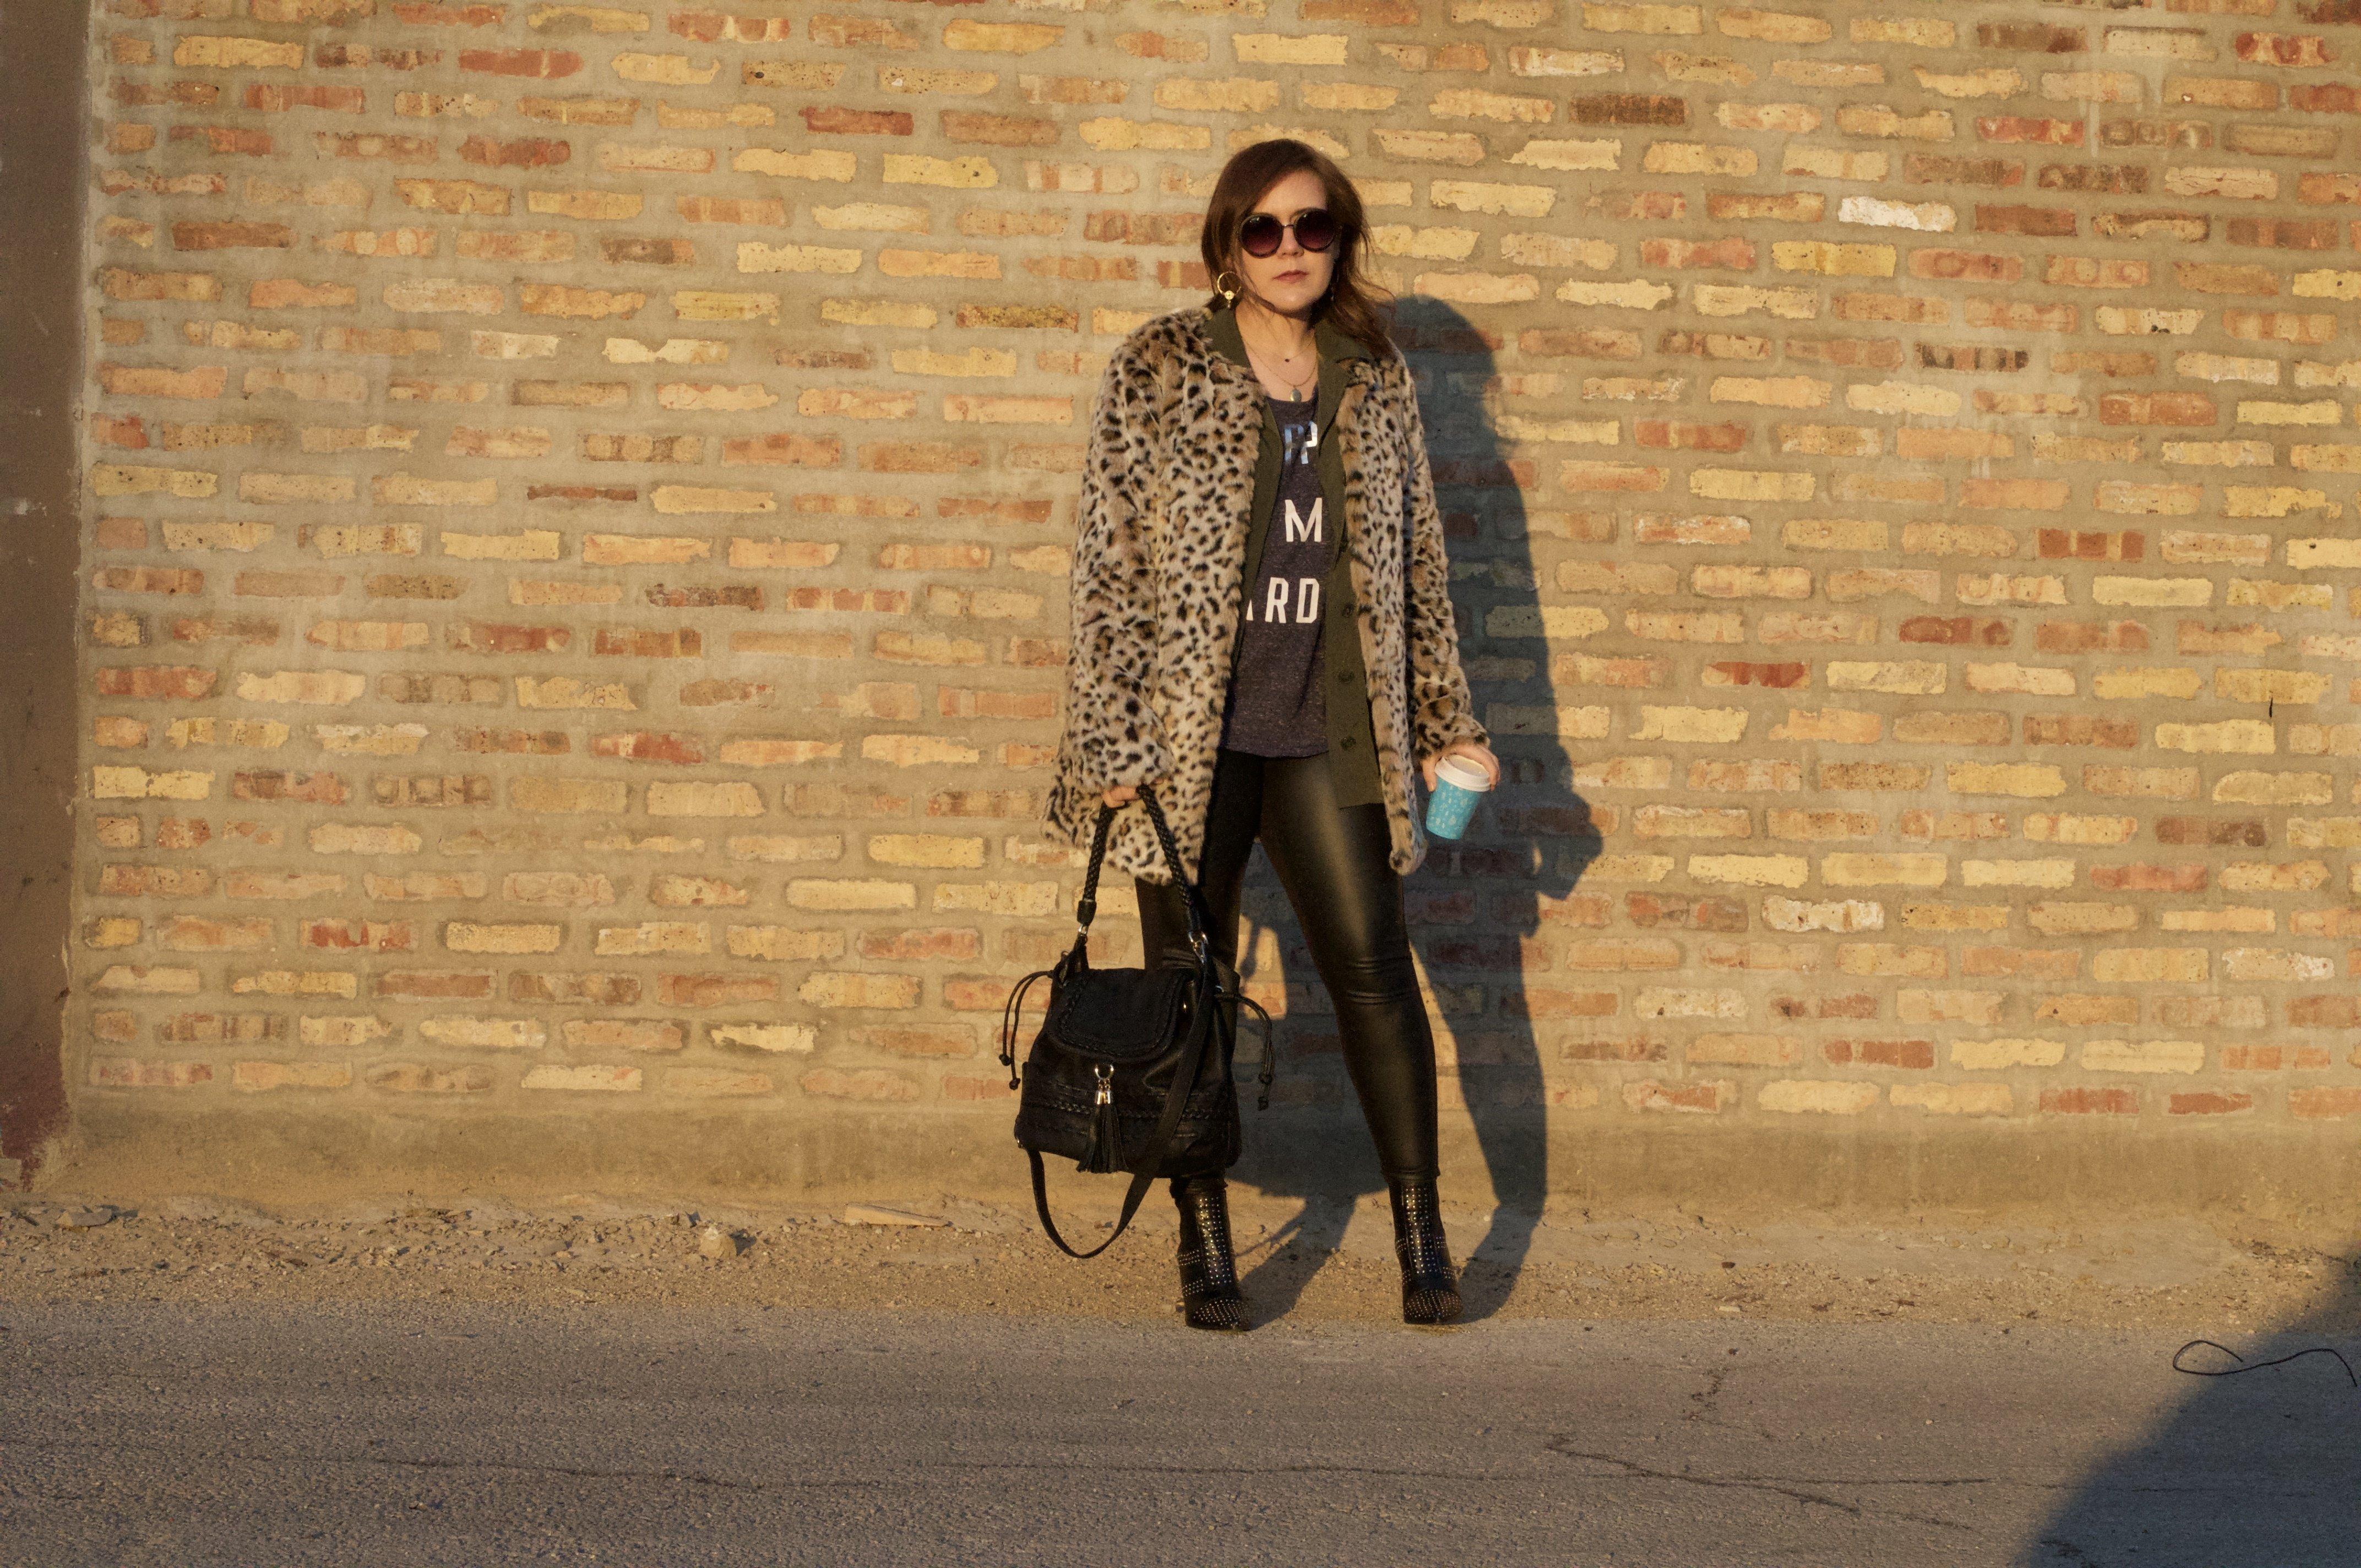 Luxe List - Leopard Print Coat